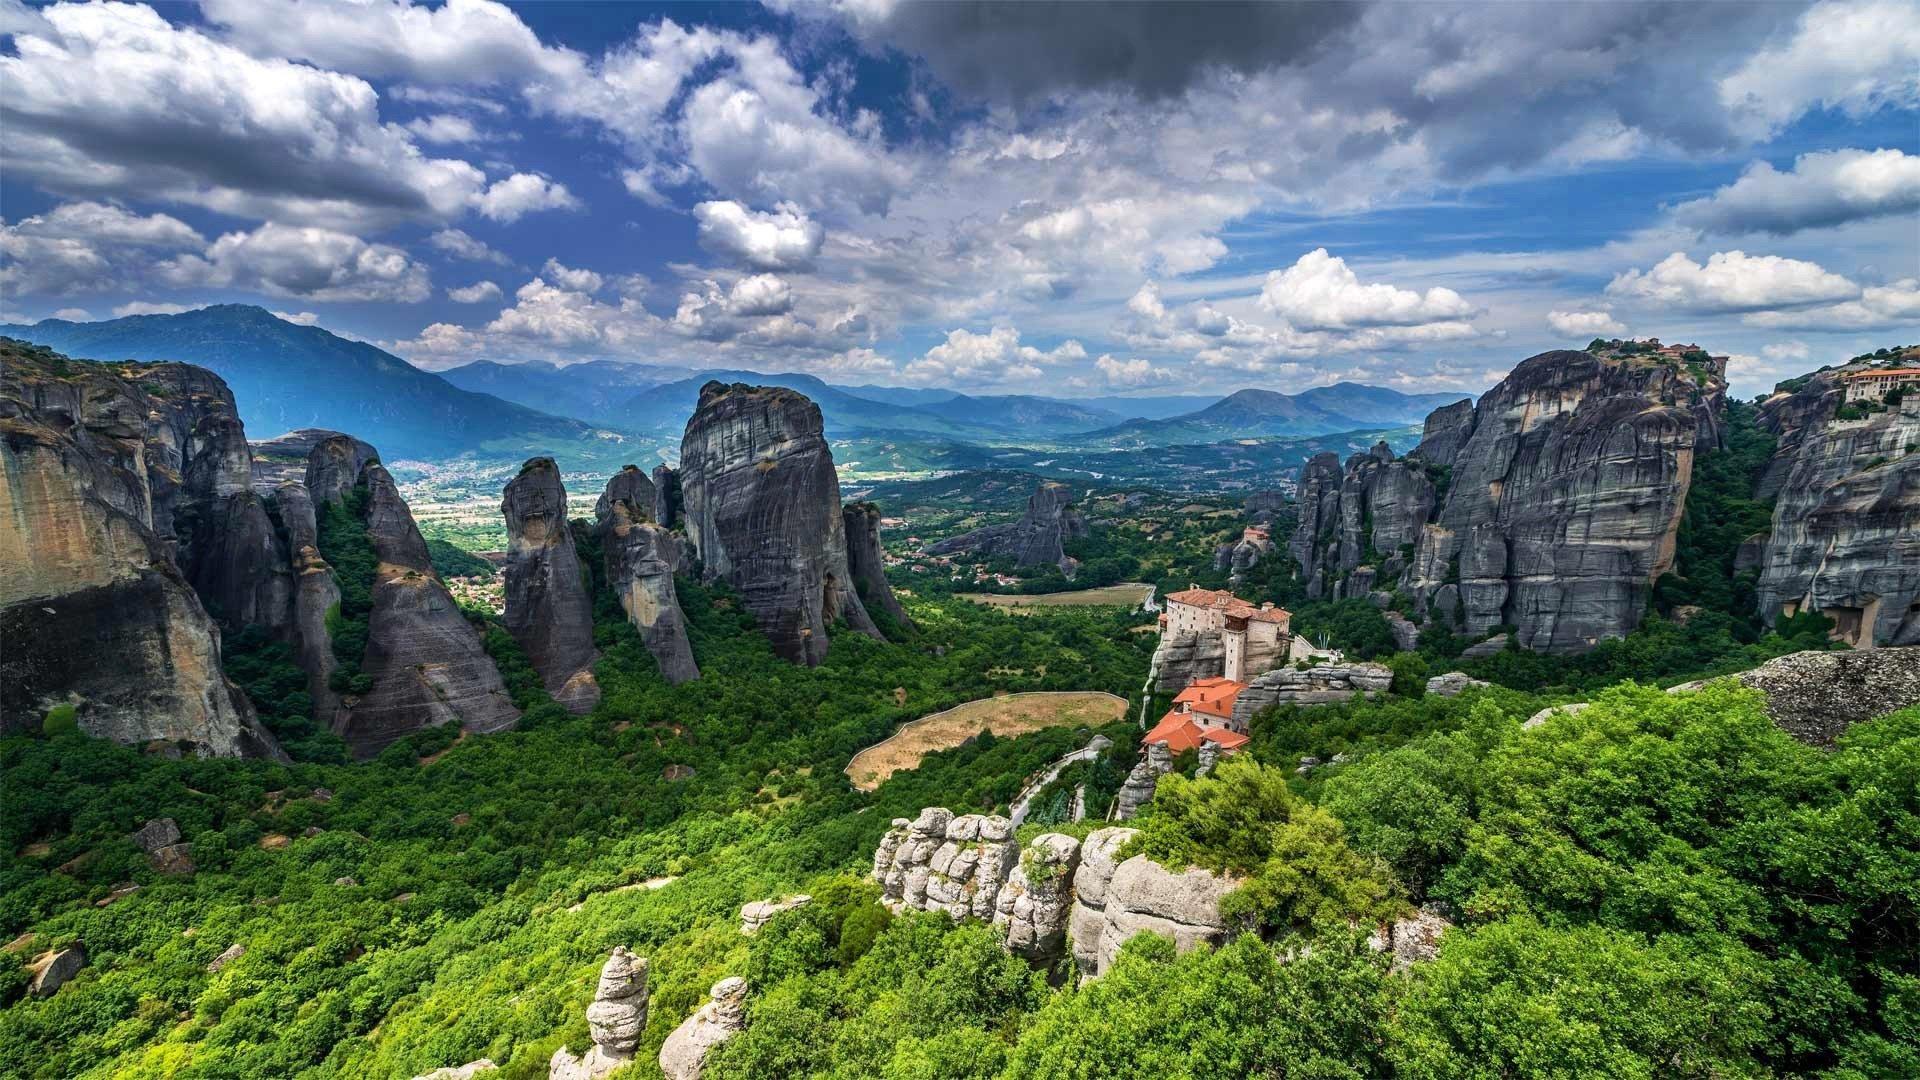 Rain Fall Hd Wallpaper Download Meteora Greece Hd Wallpaper Background Image